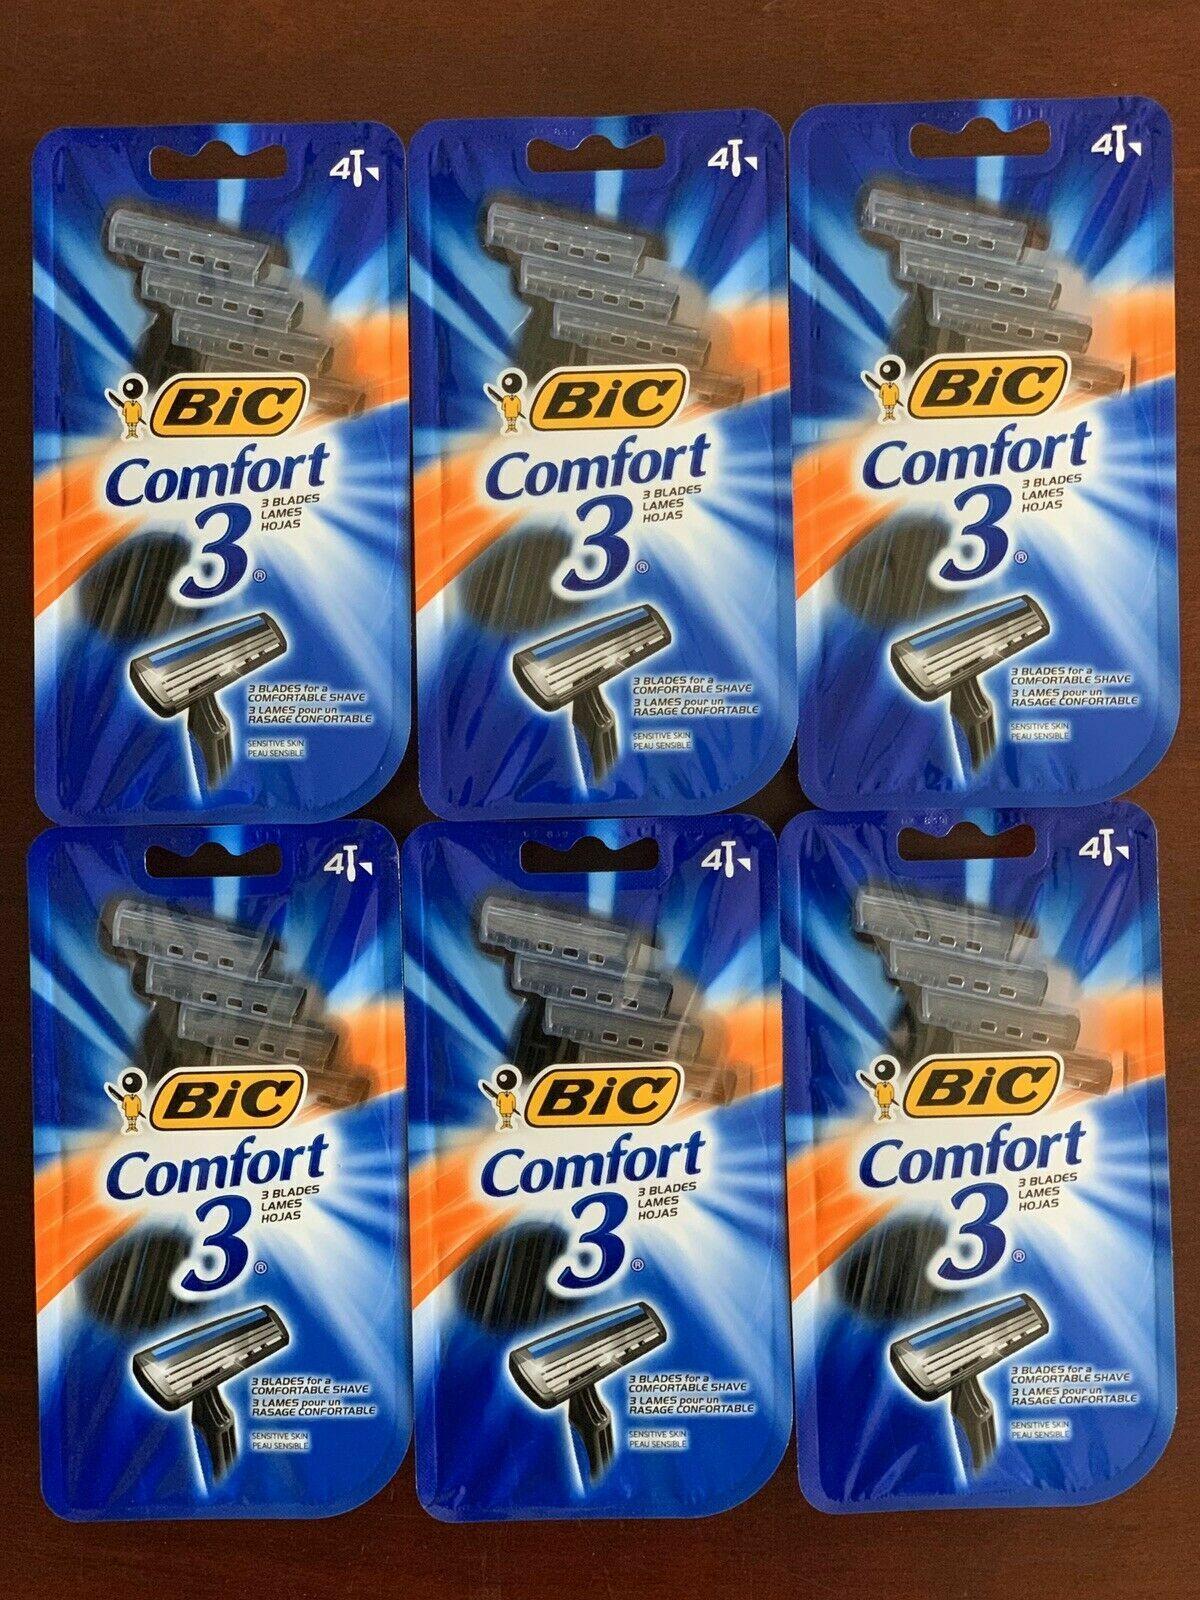 Bic Comfort 3 Men Razor 4 Size 4ct Bic Comfort 3 Men Razor 4